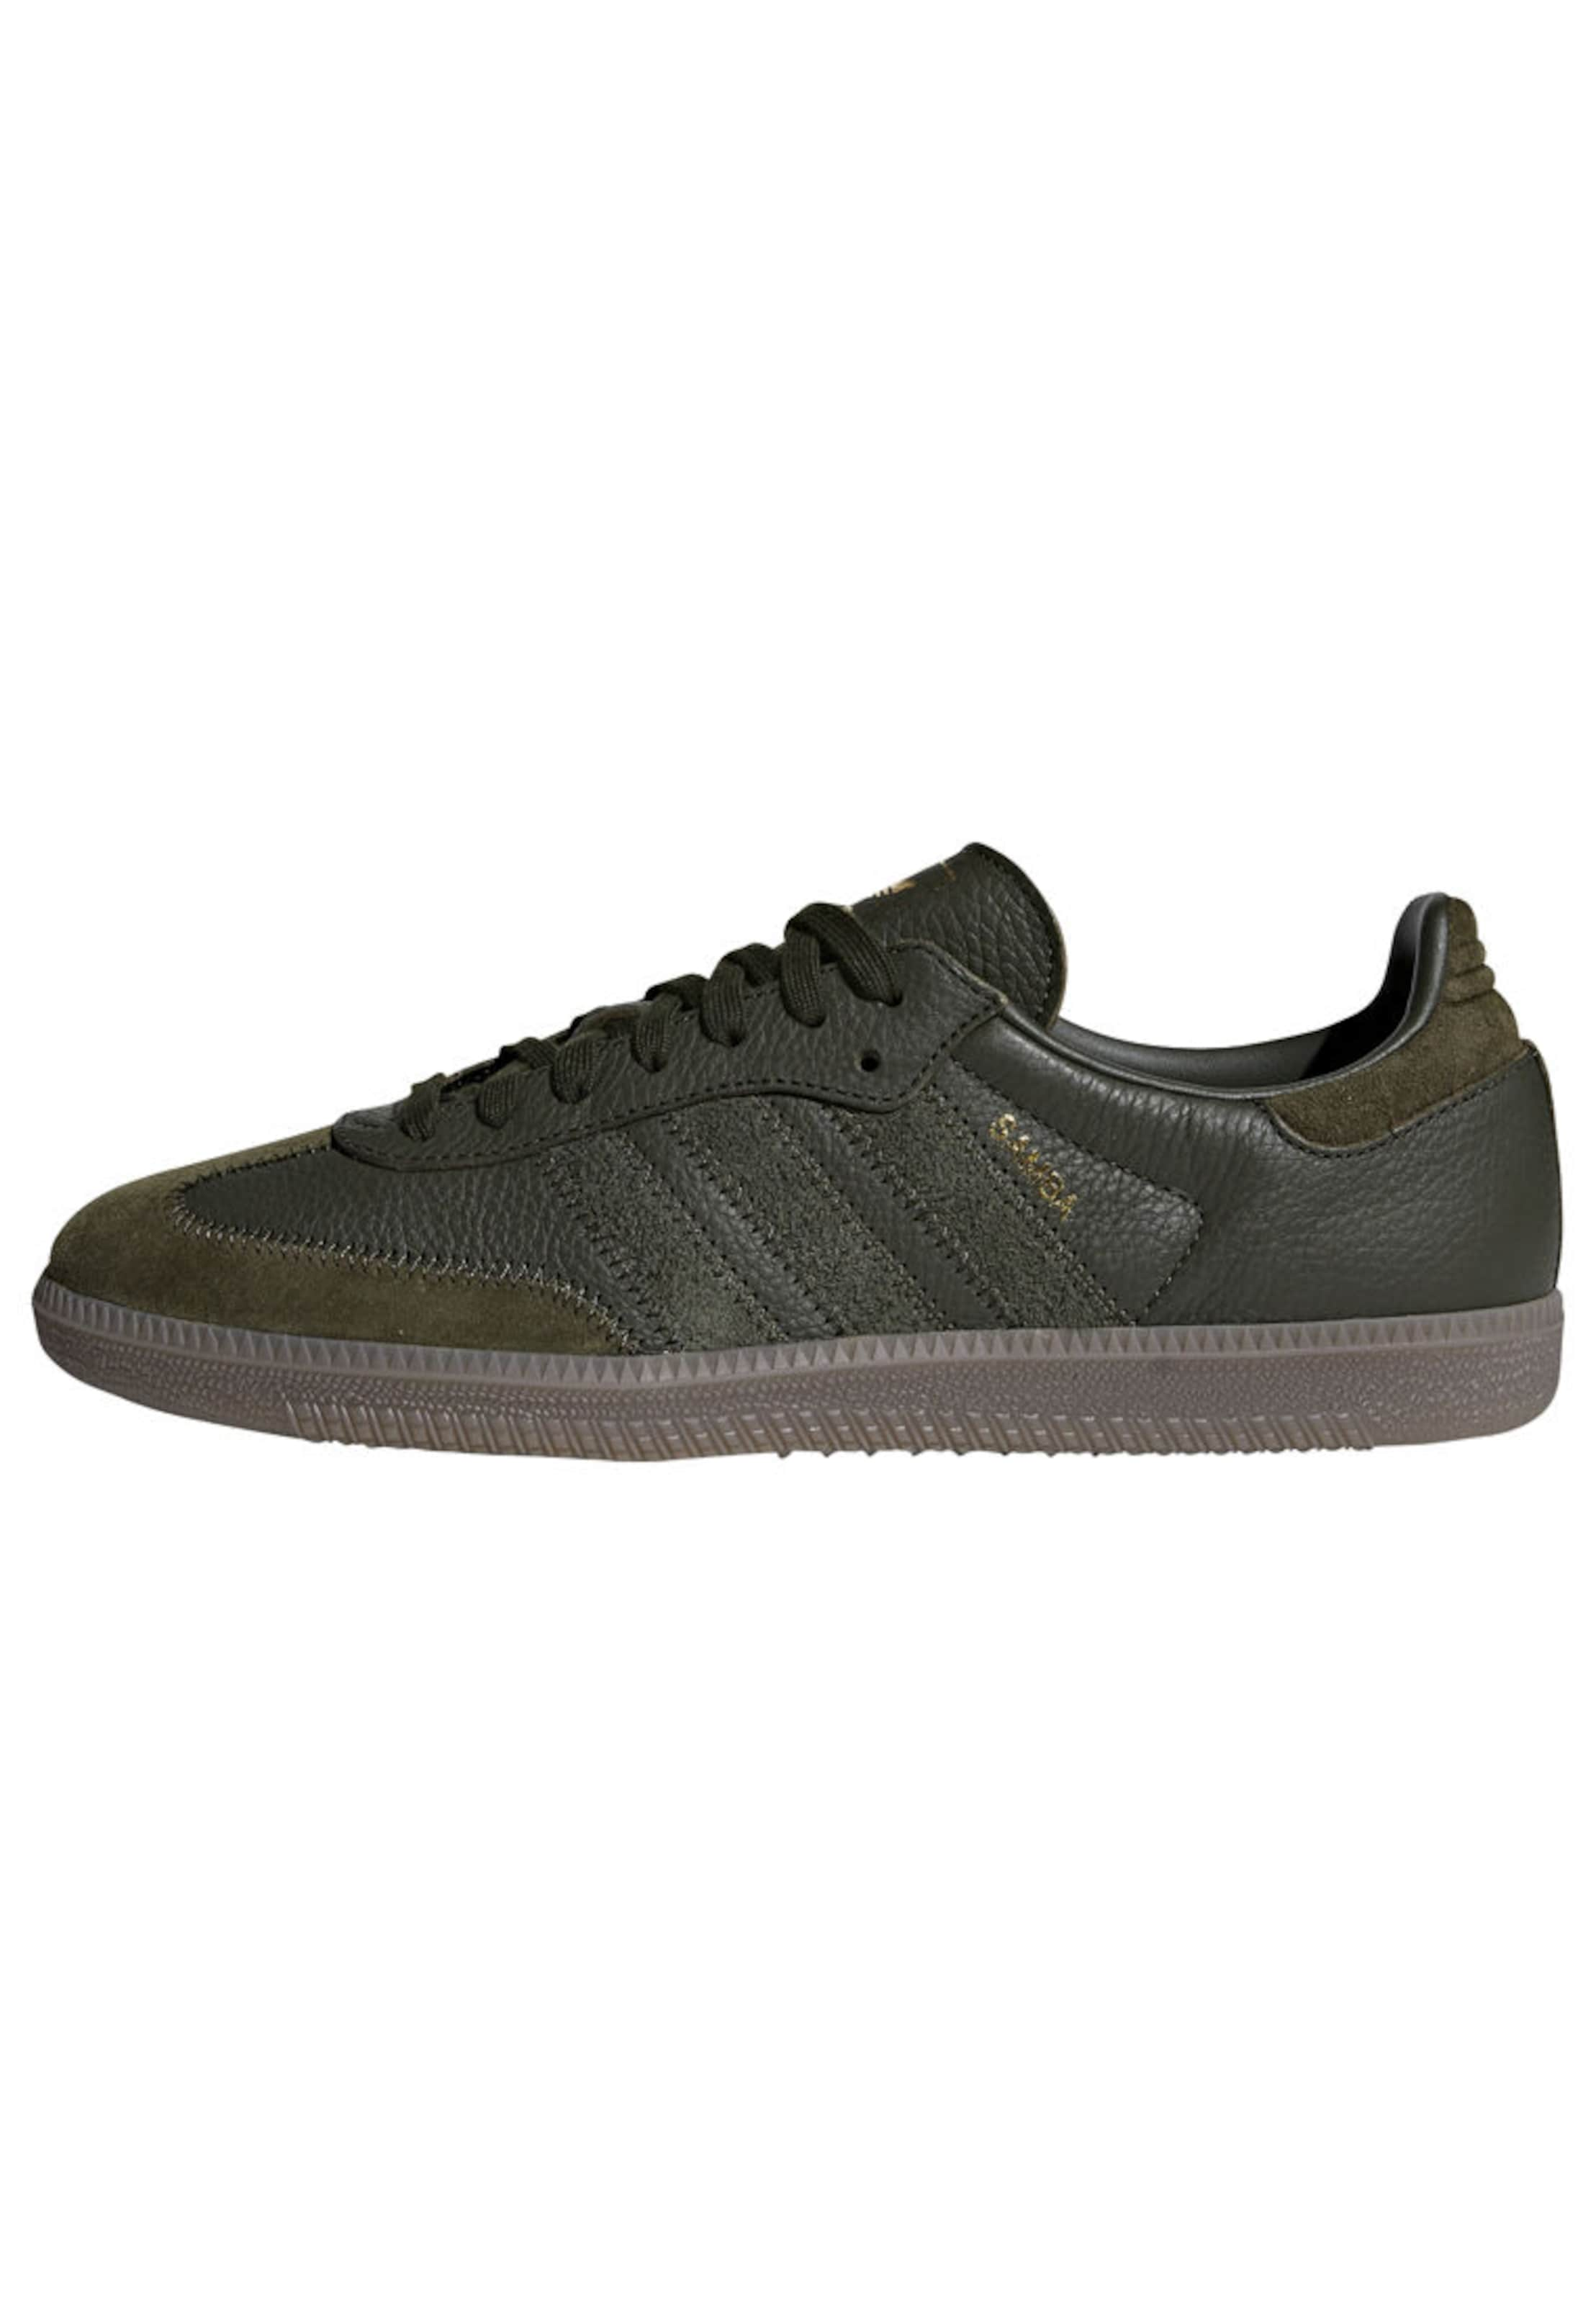 In Adidas Sneaker 'samba' Originals KhakiOliv 8Pnk0OXw